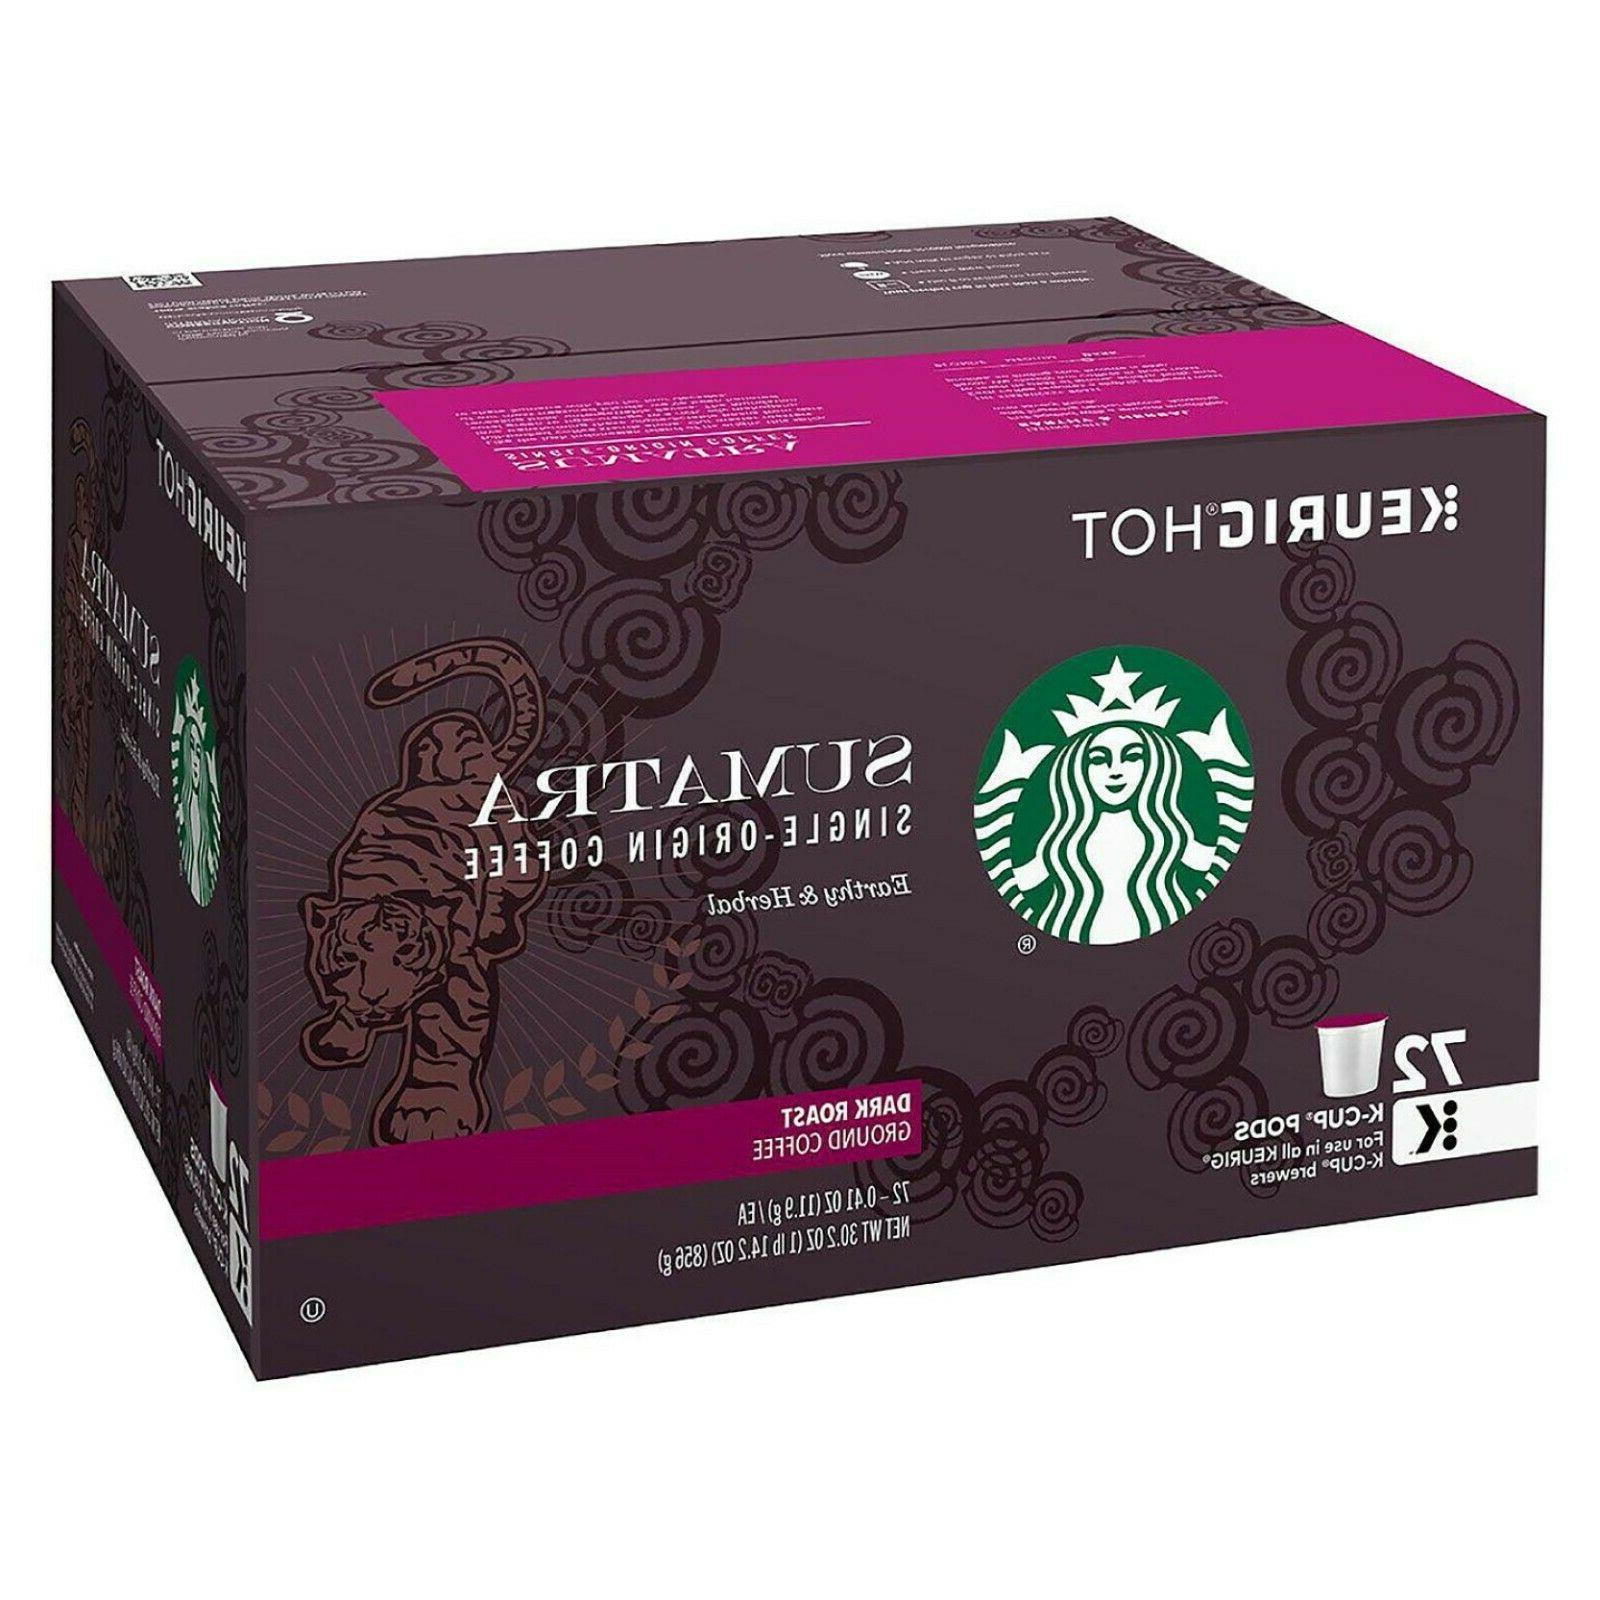 Starbucks Sumatra 72 ct.Dark Coffee FREE